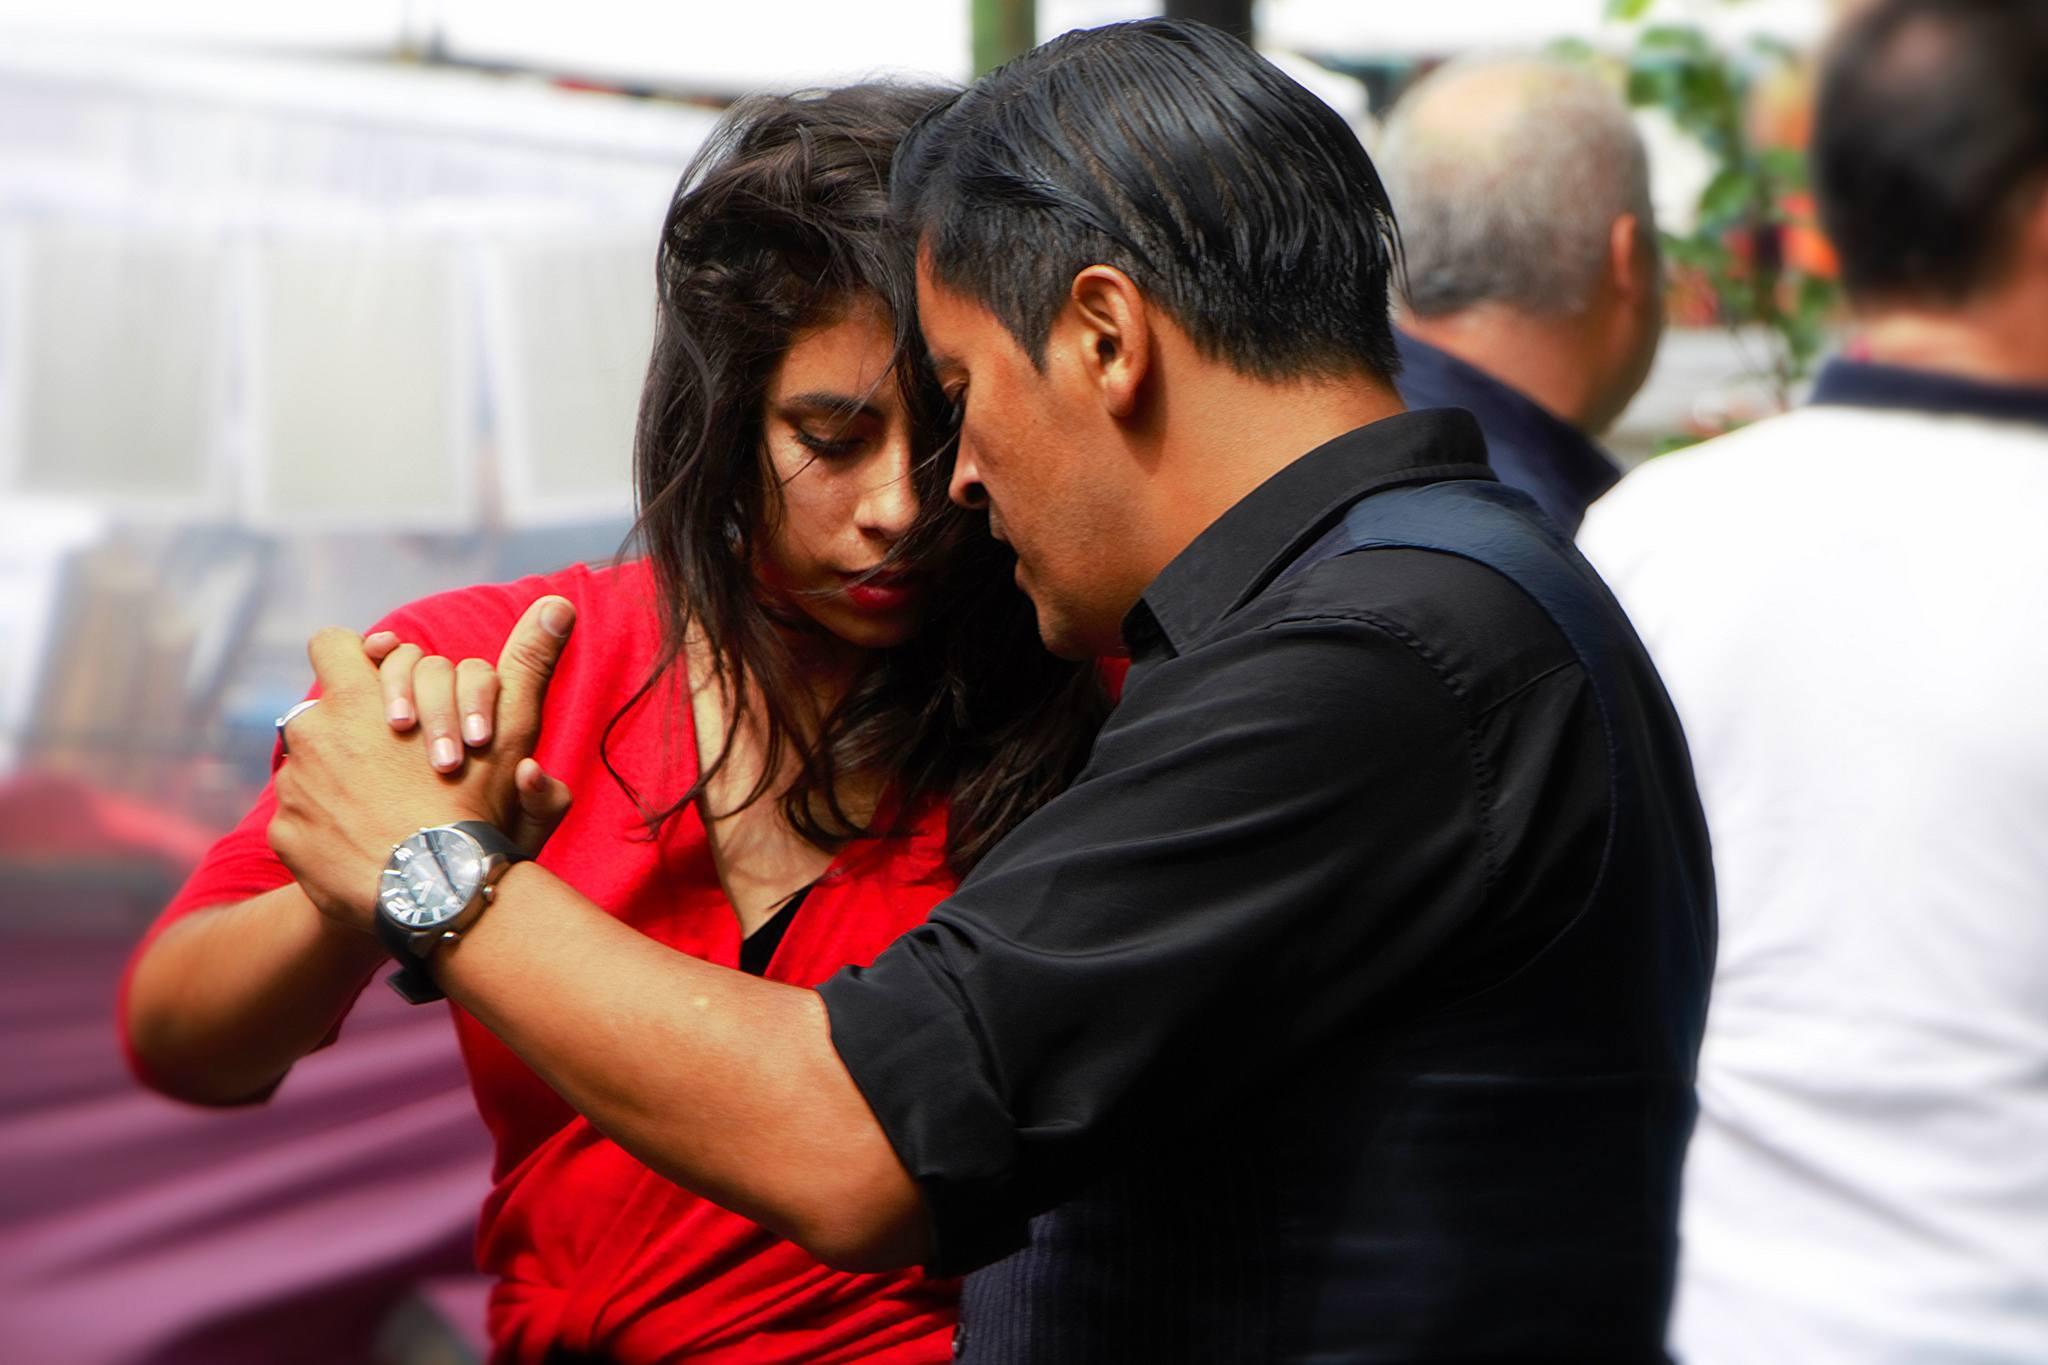 Tango in La Boca. Buenos Aires, Argentina. Photo: Flickr Juan Antonio F. Segal